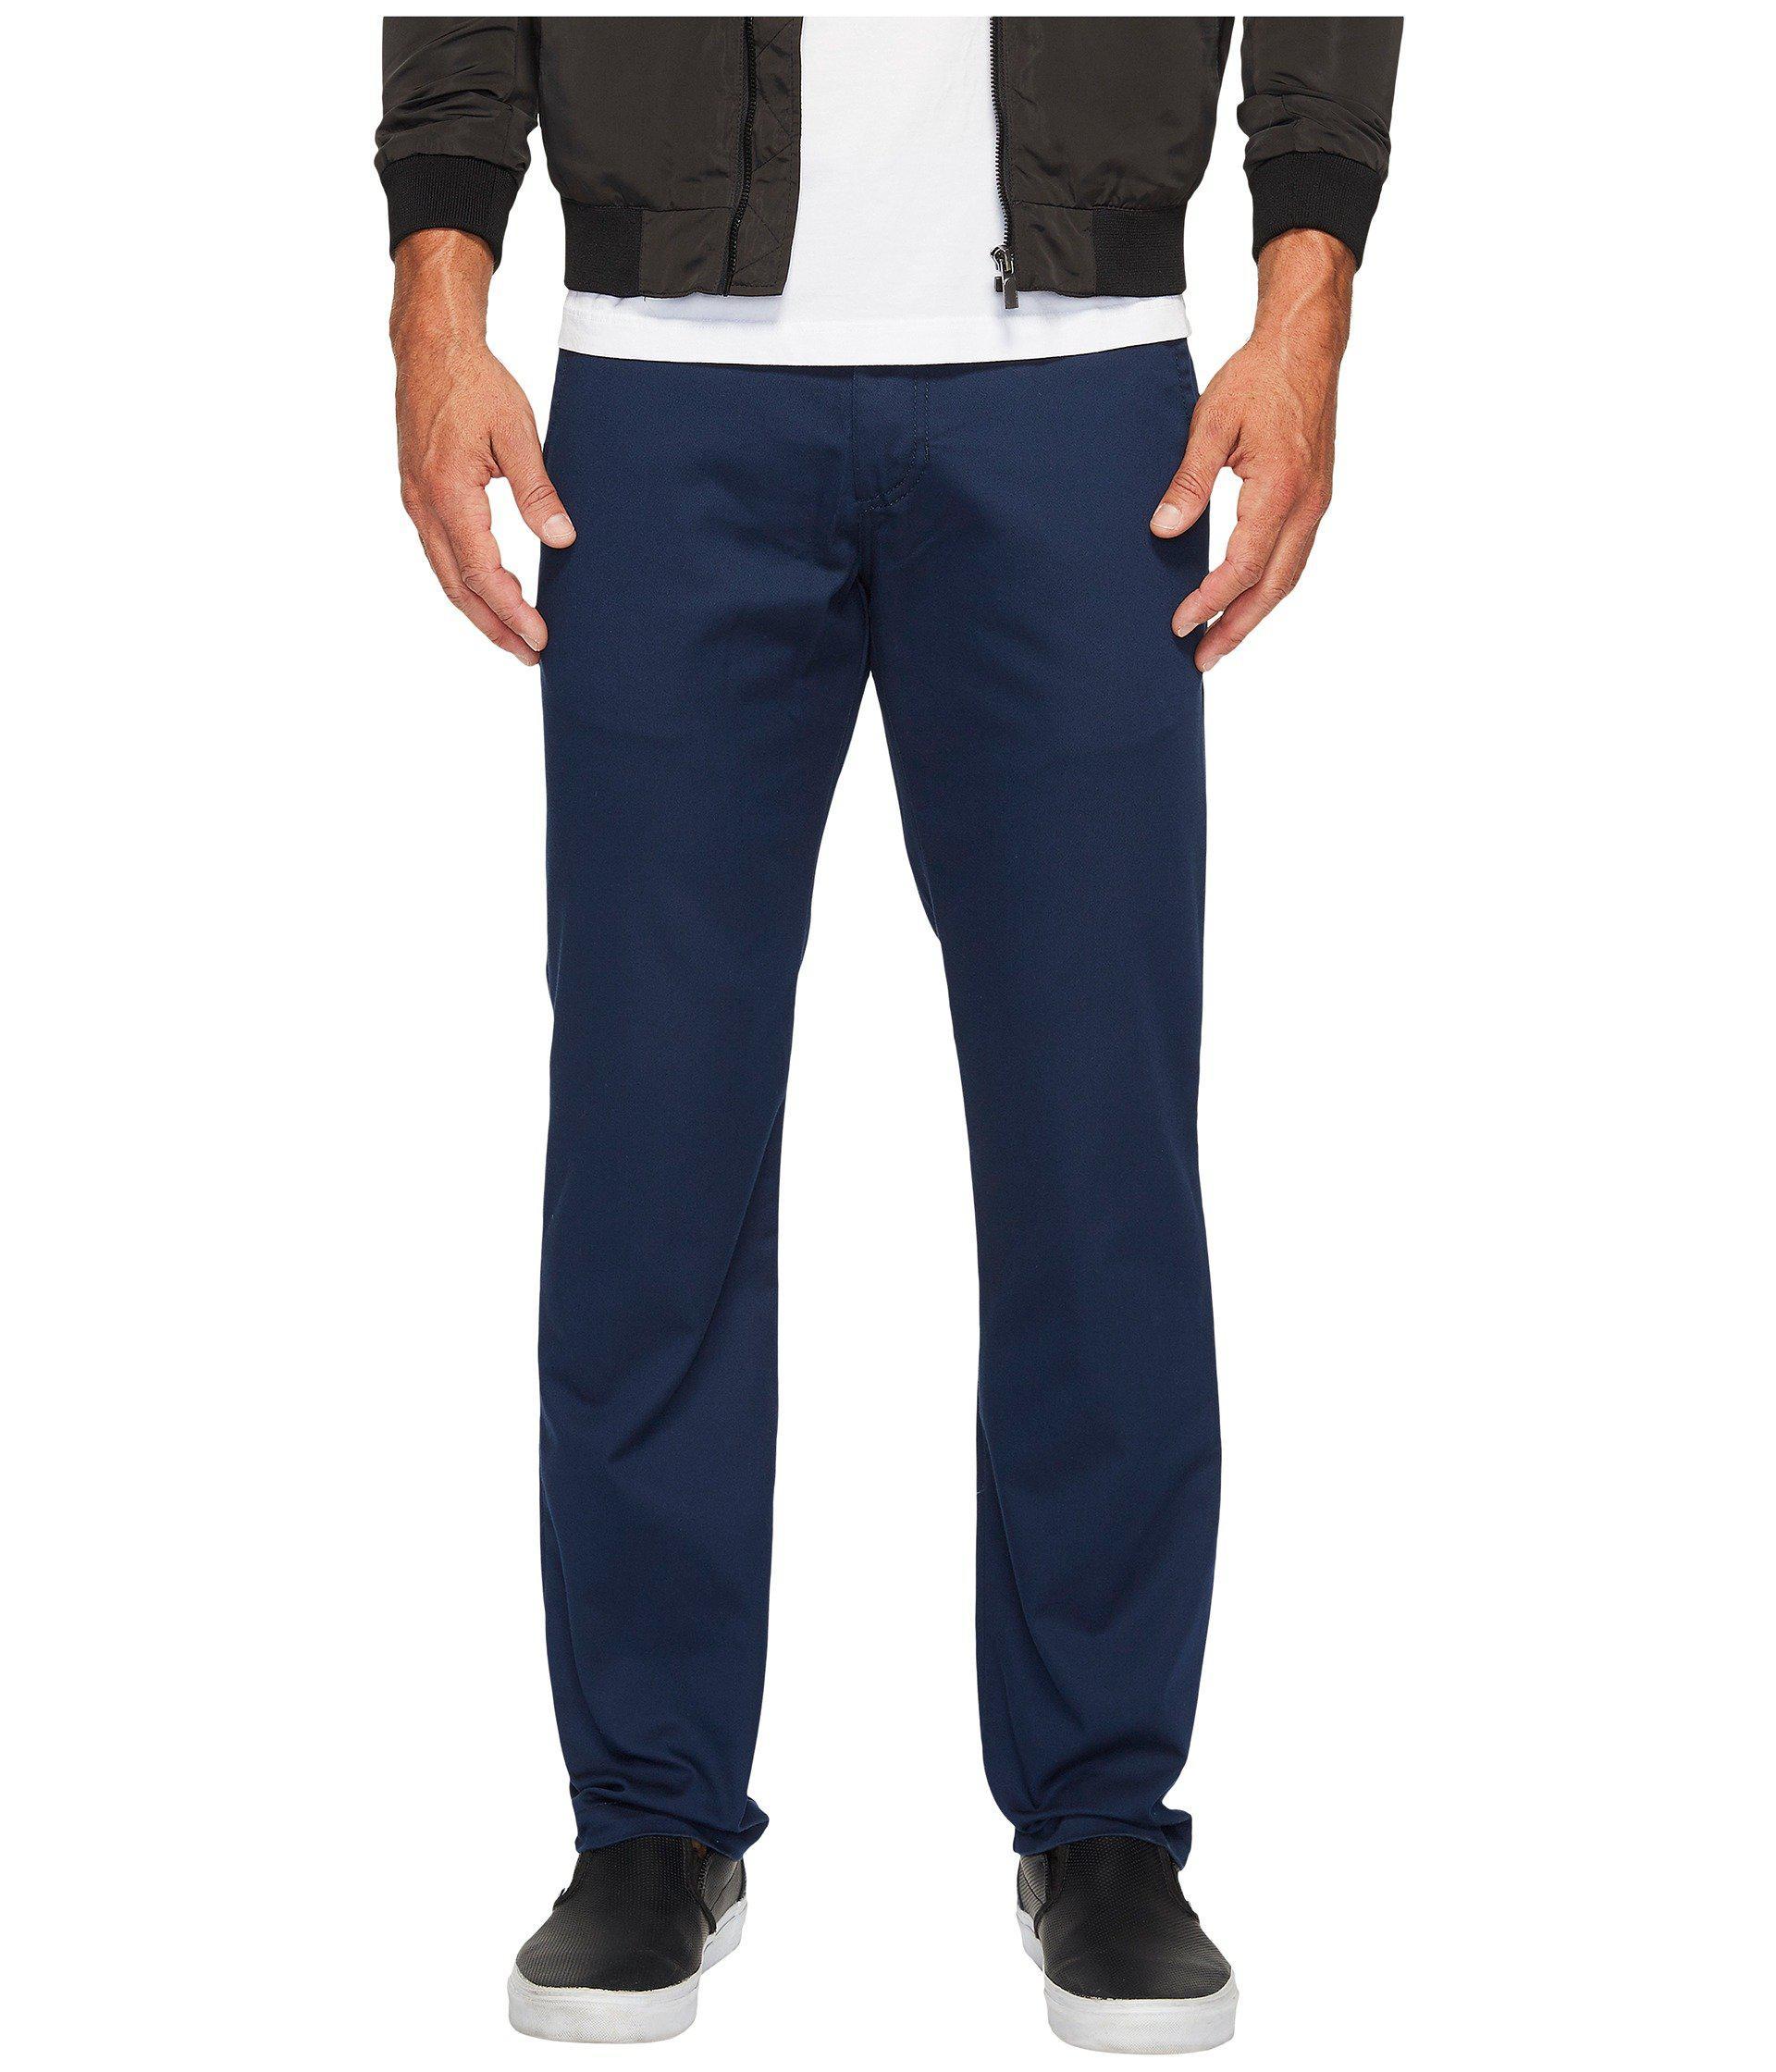 61225693da Mens Dress Chino Pants | Saddha